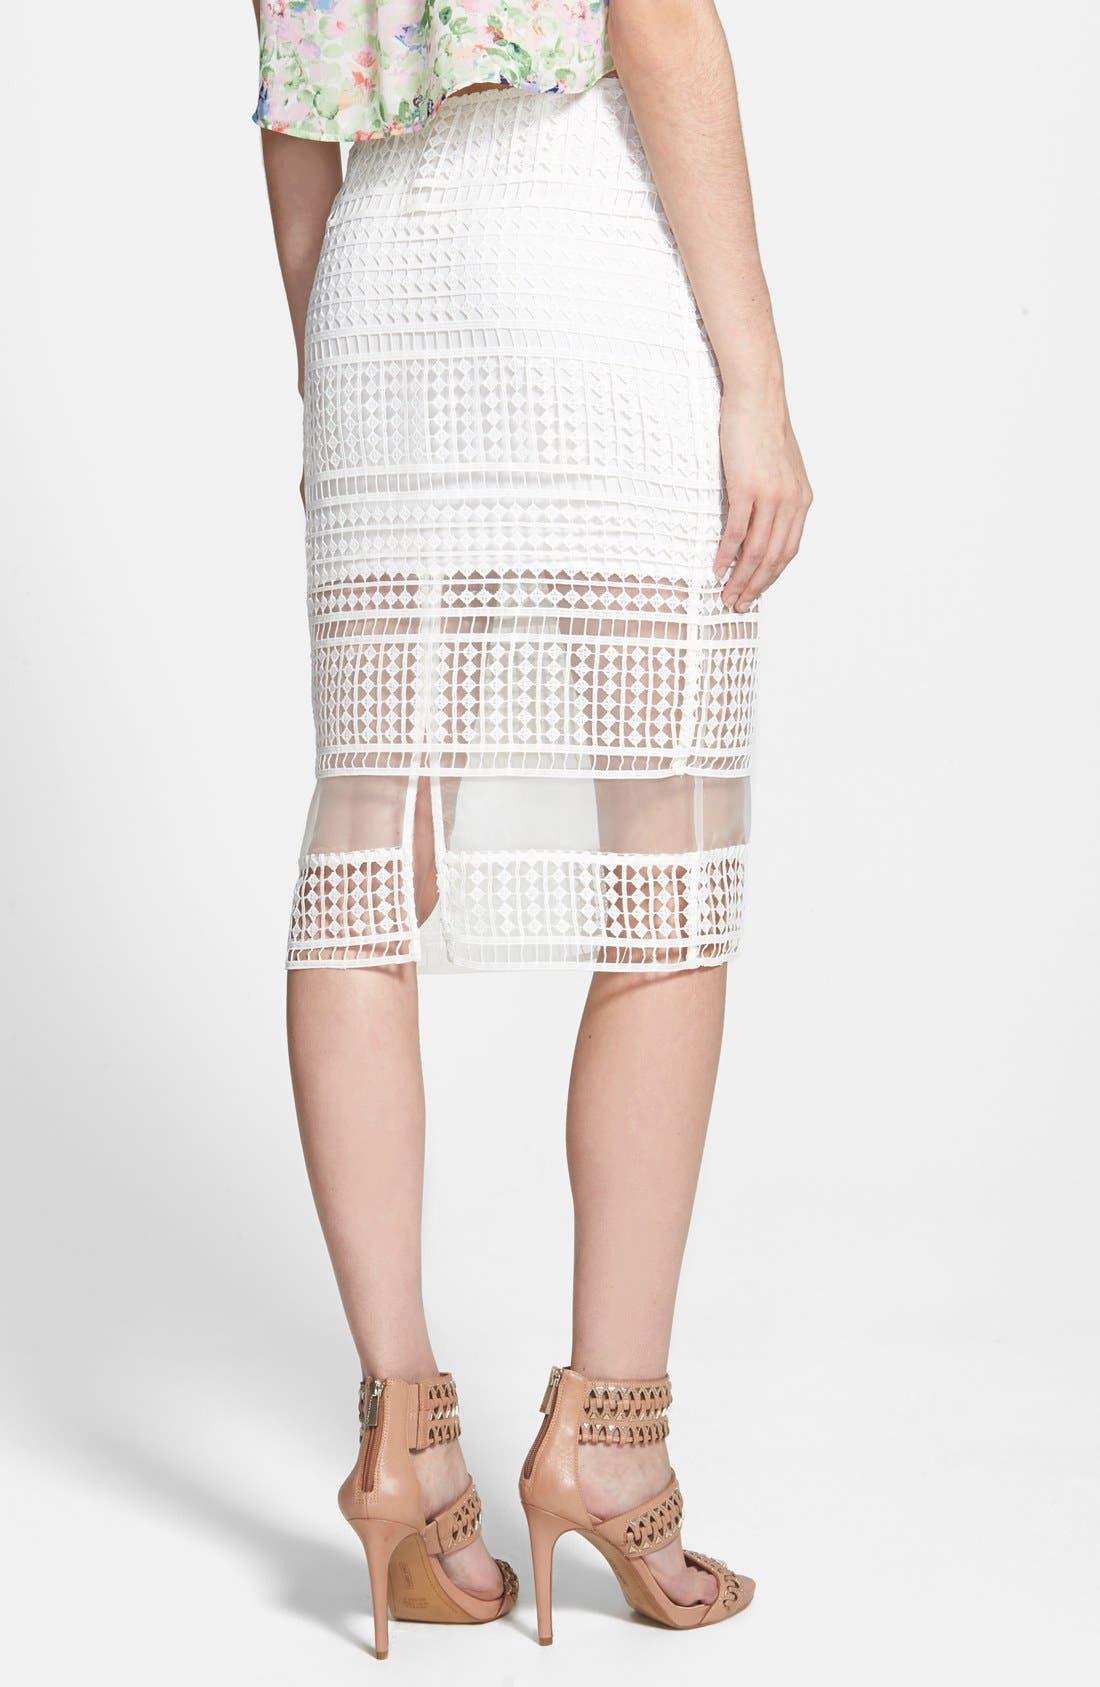 J.O.A., Lace Overlay Pencil Skirt, Alternate thumbnail 3, color, 900